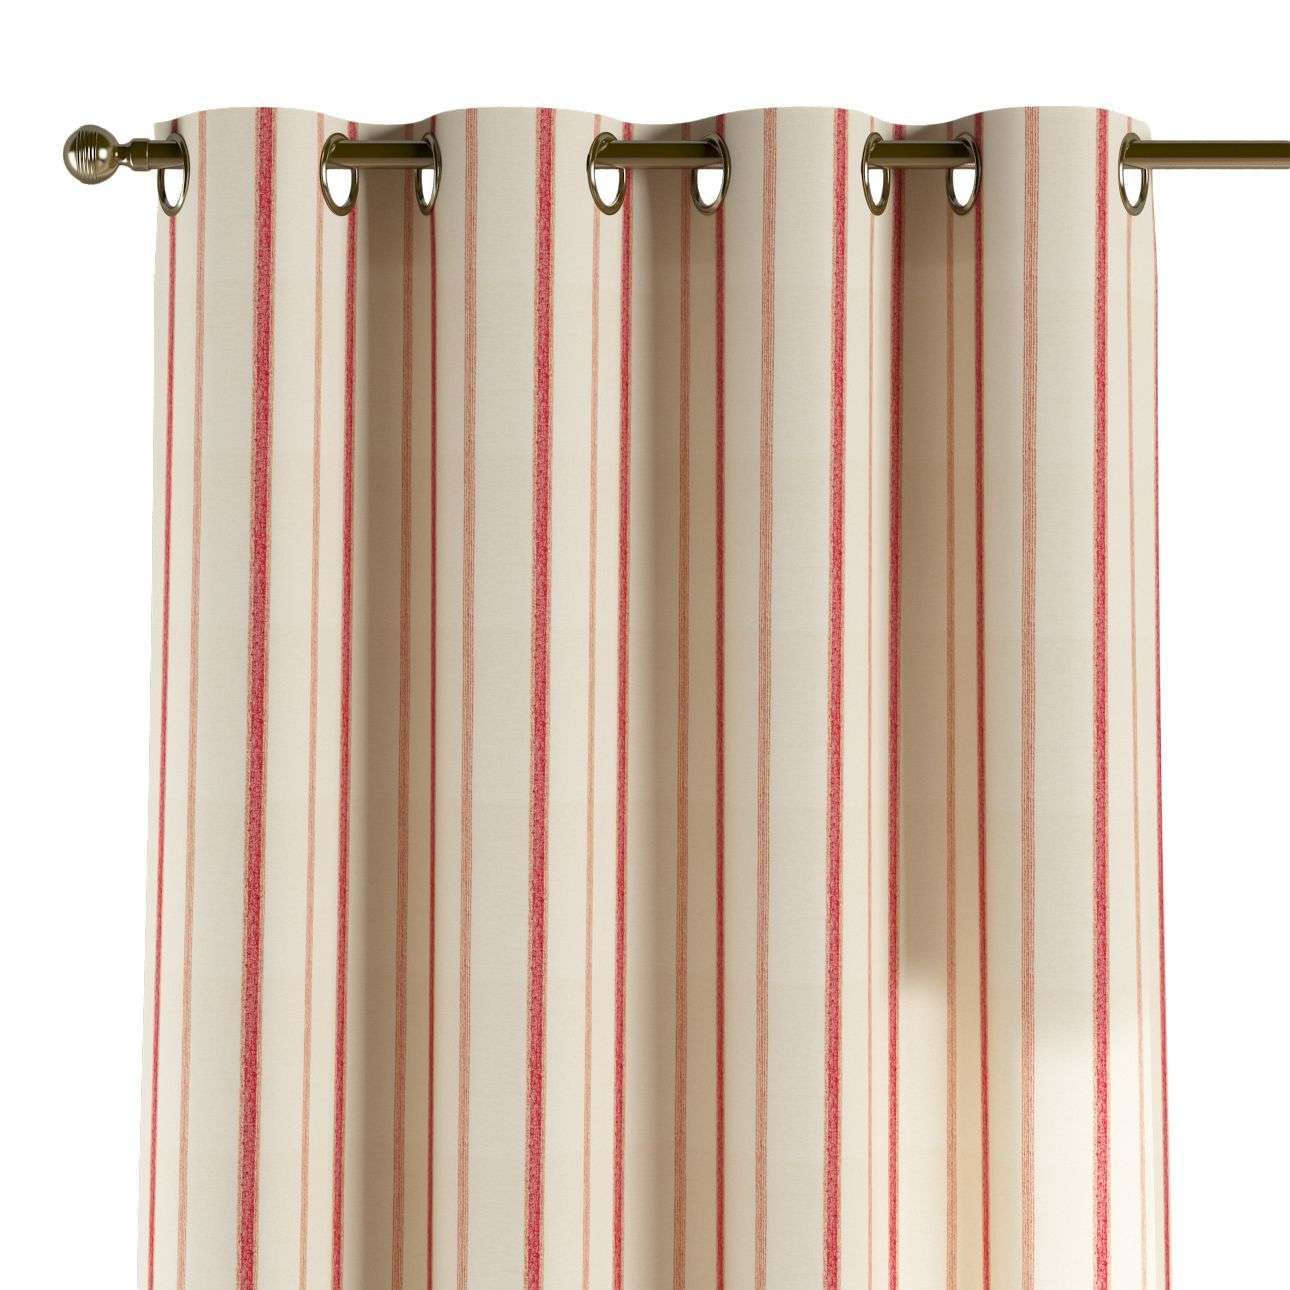 Záves s kolieskami V kolekcii Avinon, tkanina: 129-15